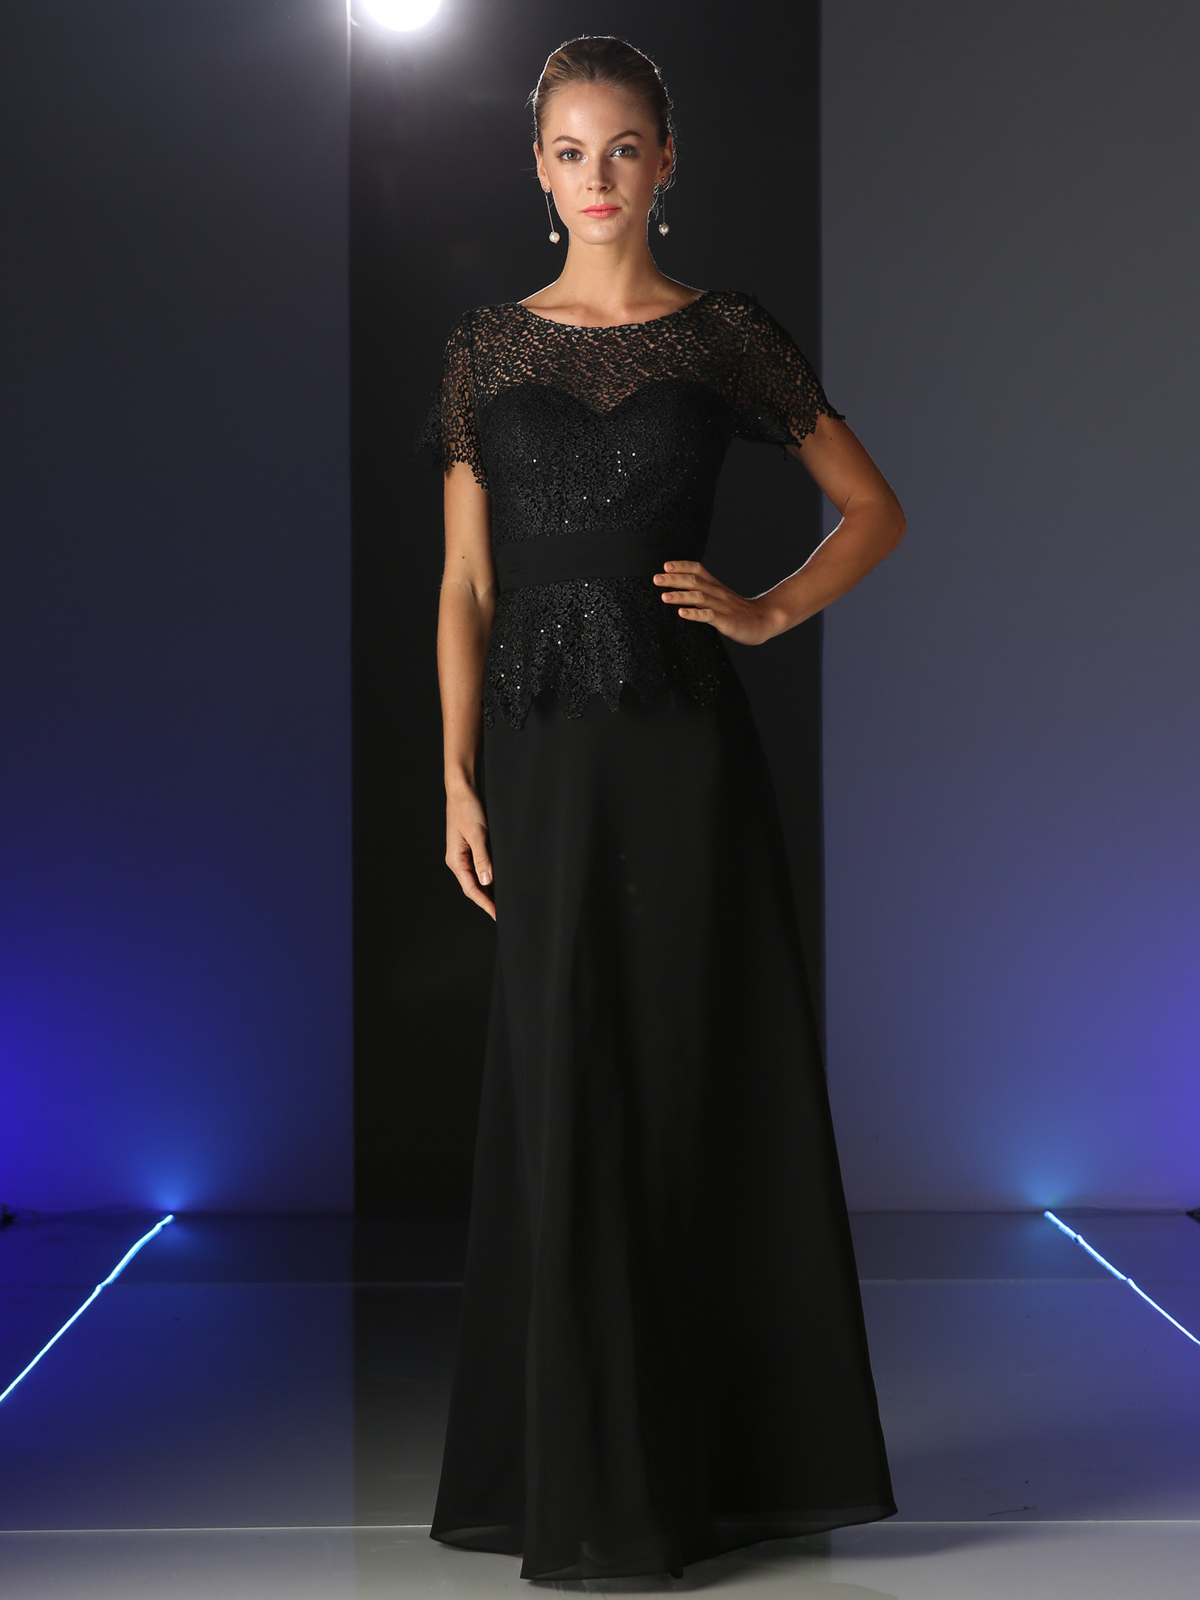 Mother Of The Bride Black Dresses - Wedding Dress Ideas